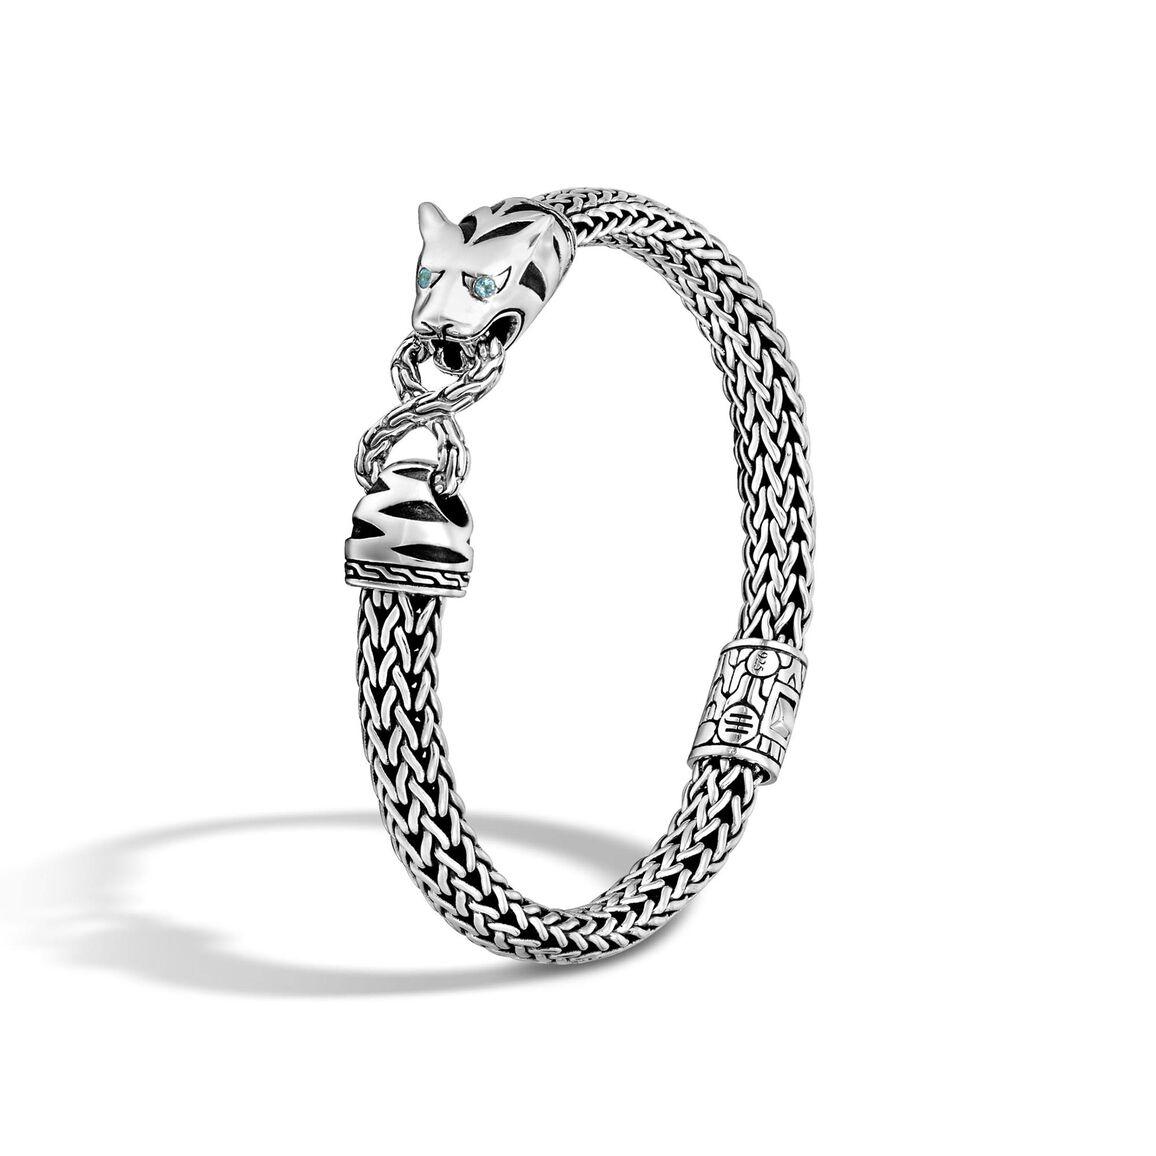 Legends Macan 6.5MM Station Bracelet in Silver